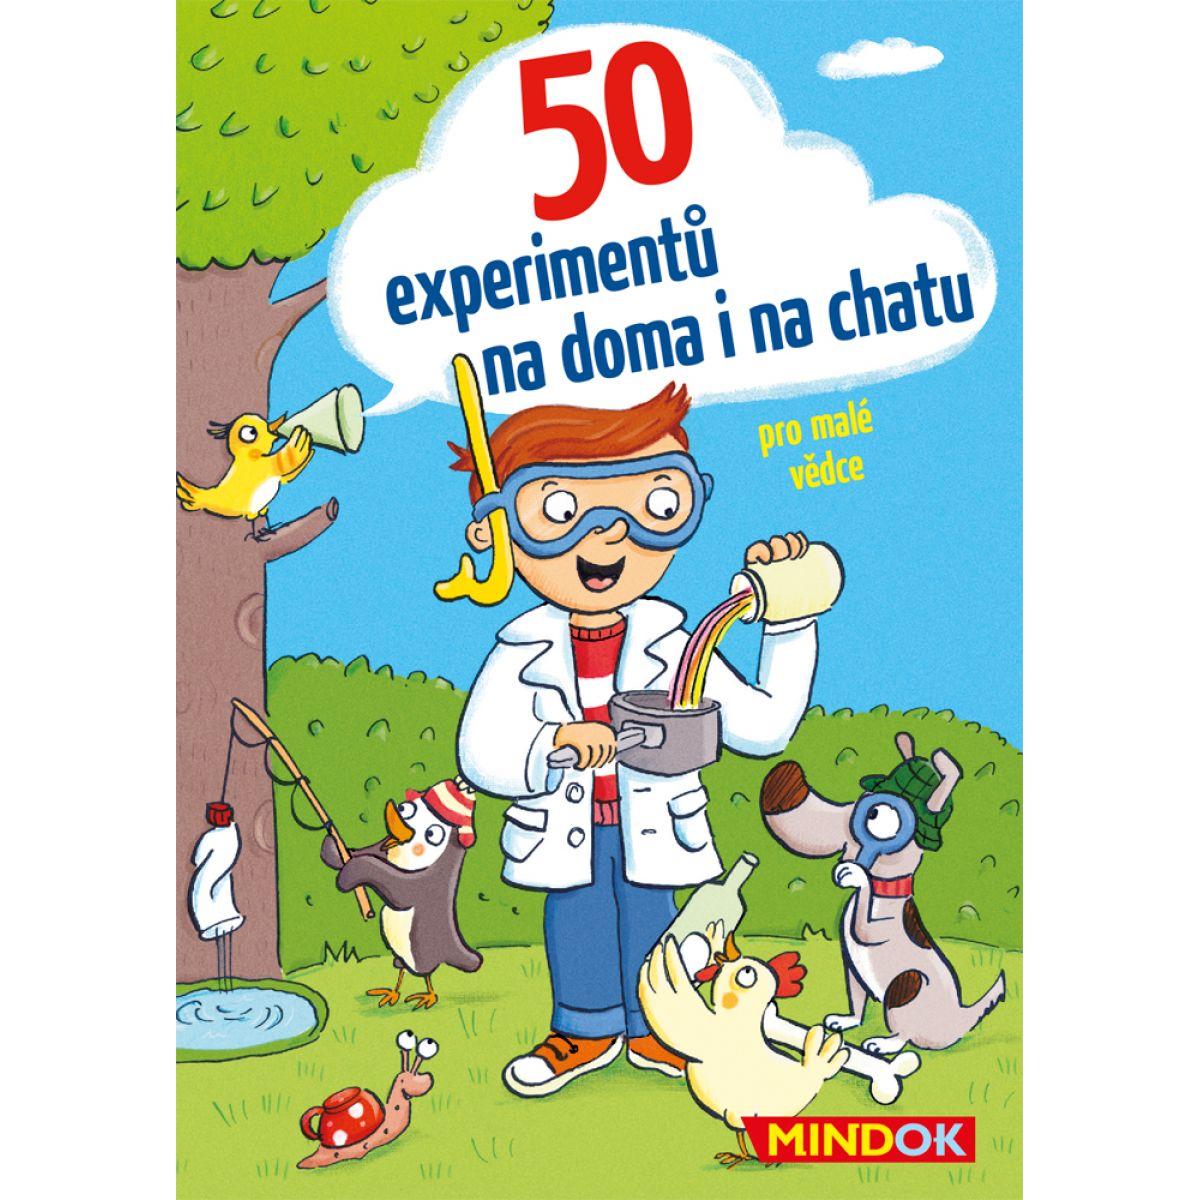 Mindok 50 Experimentů na doma i na chatu